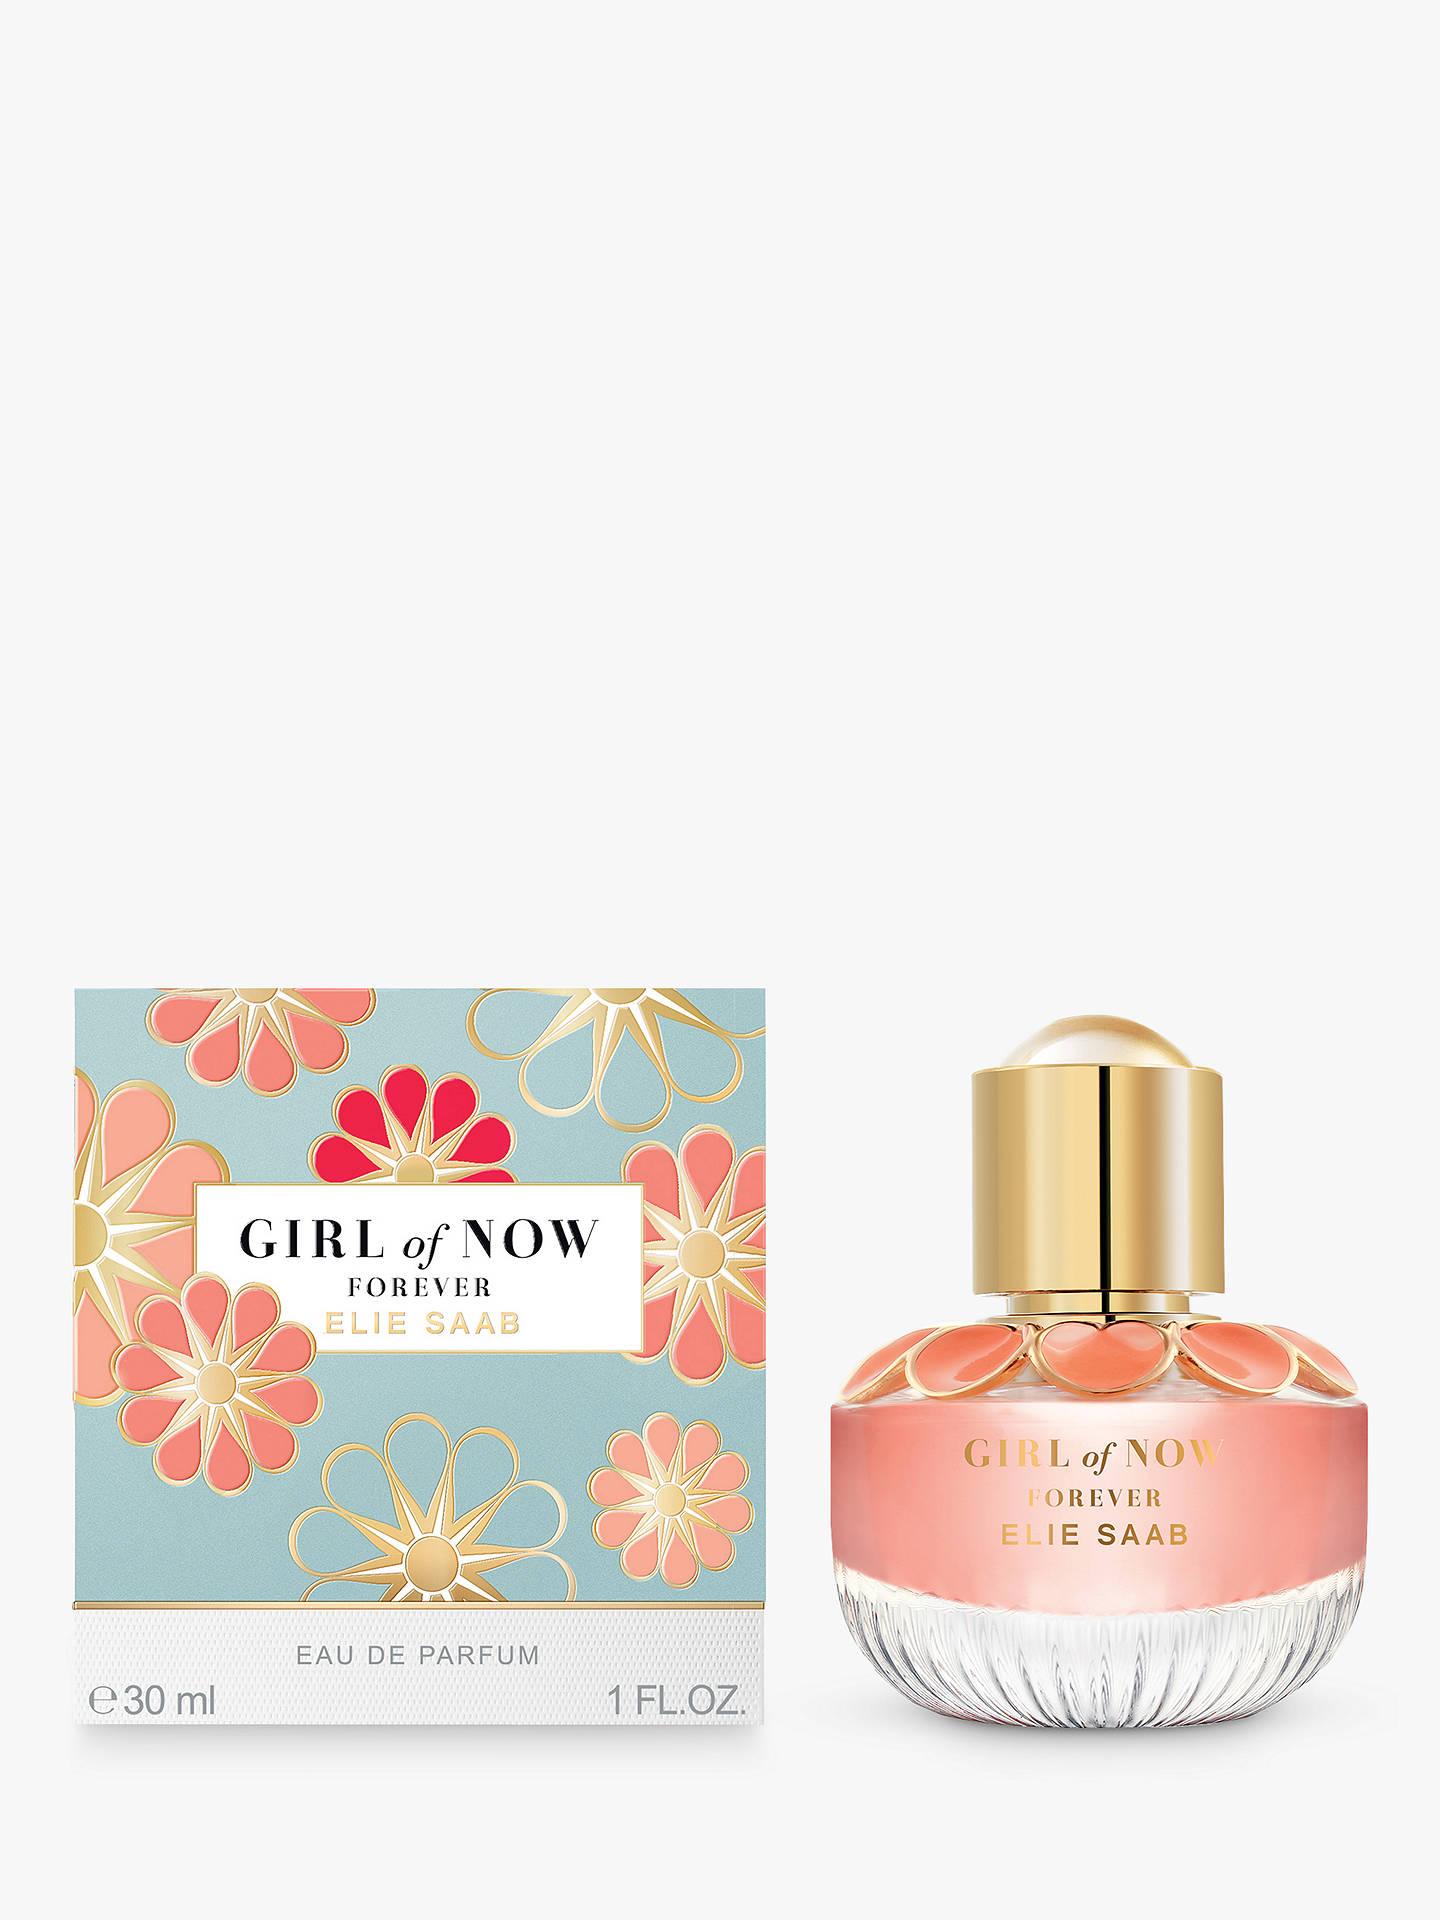 ee2b645b951f0 Elie Saab Girl of Now Forever Eau de Parfum at John Lewis   Partners